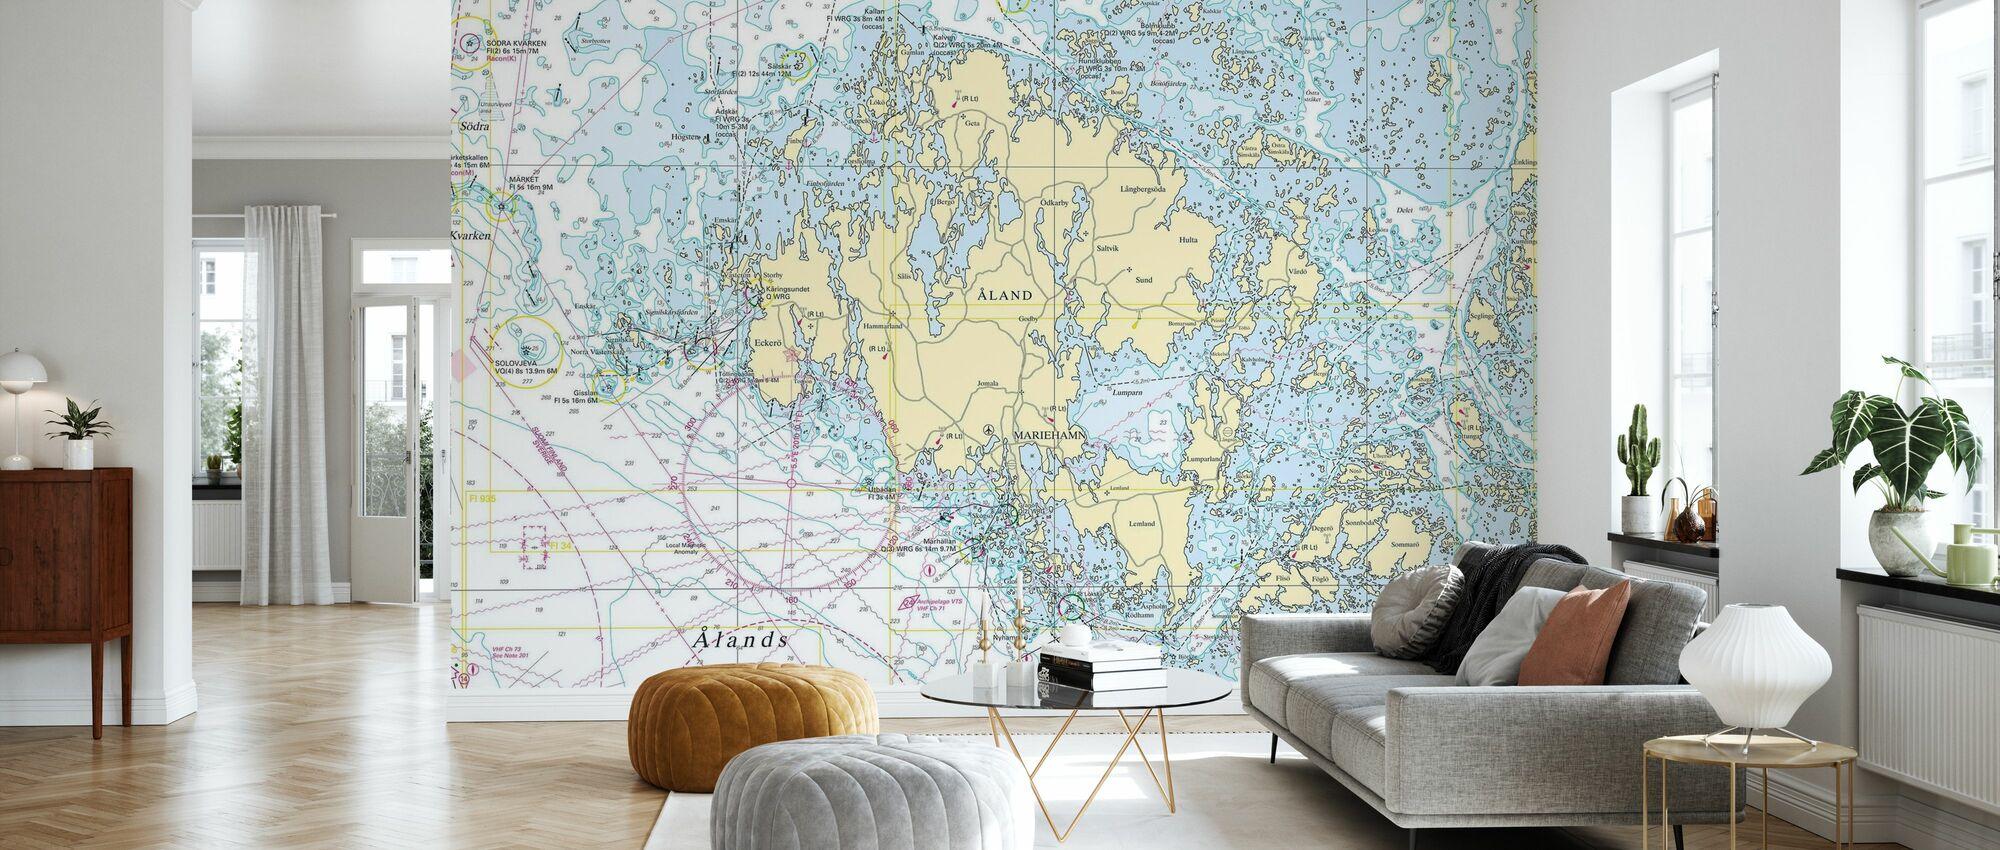 Aland Archipelago - Wallpaper - Living Room